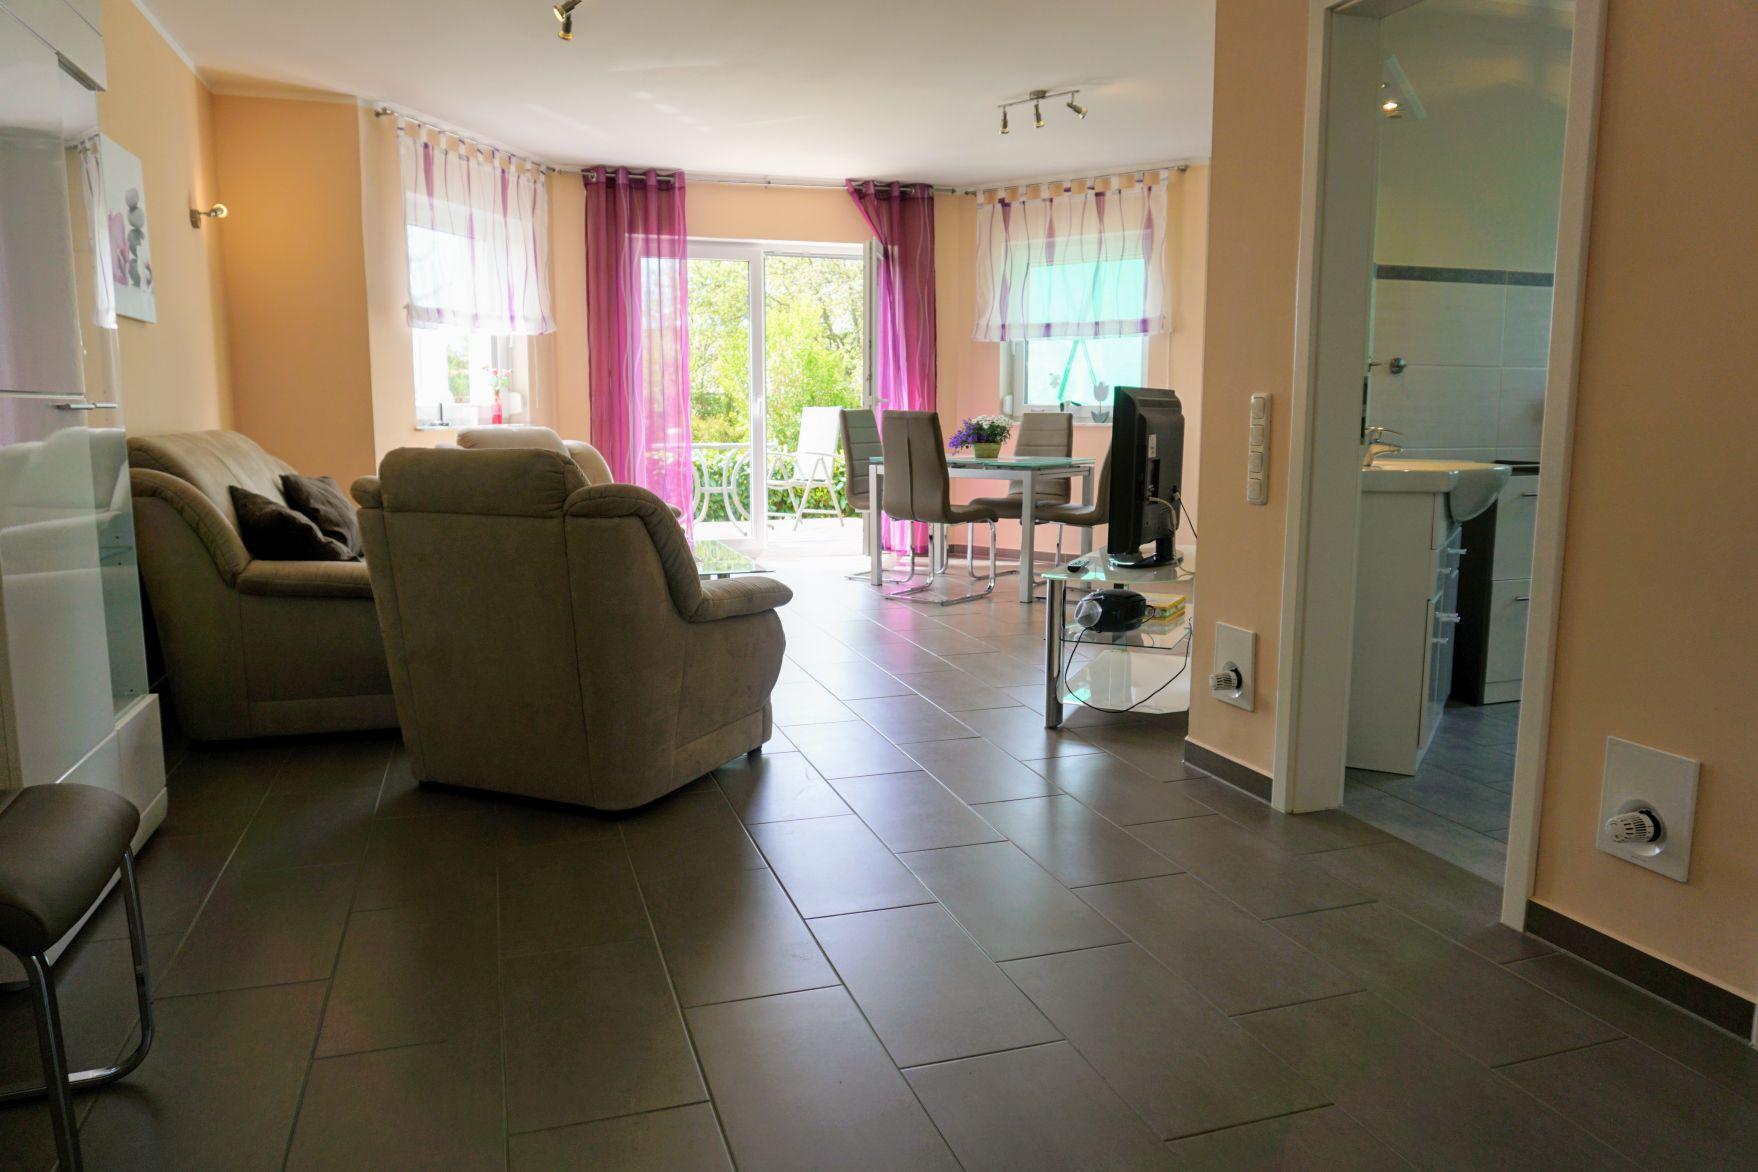 wohnung 1 gr mitz zuhause am meer. Black Bedroom Furniture Sets. Home Design Ideas